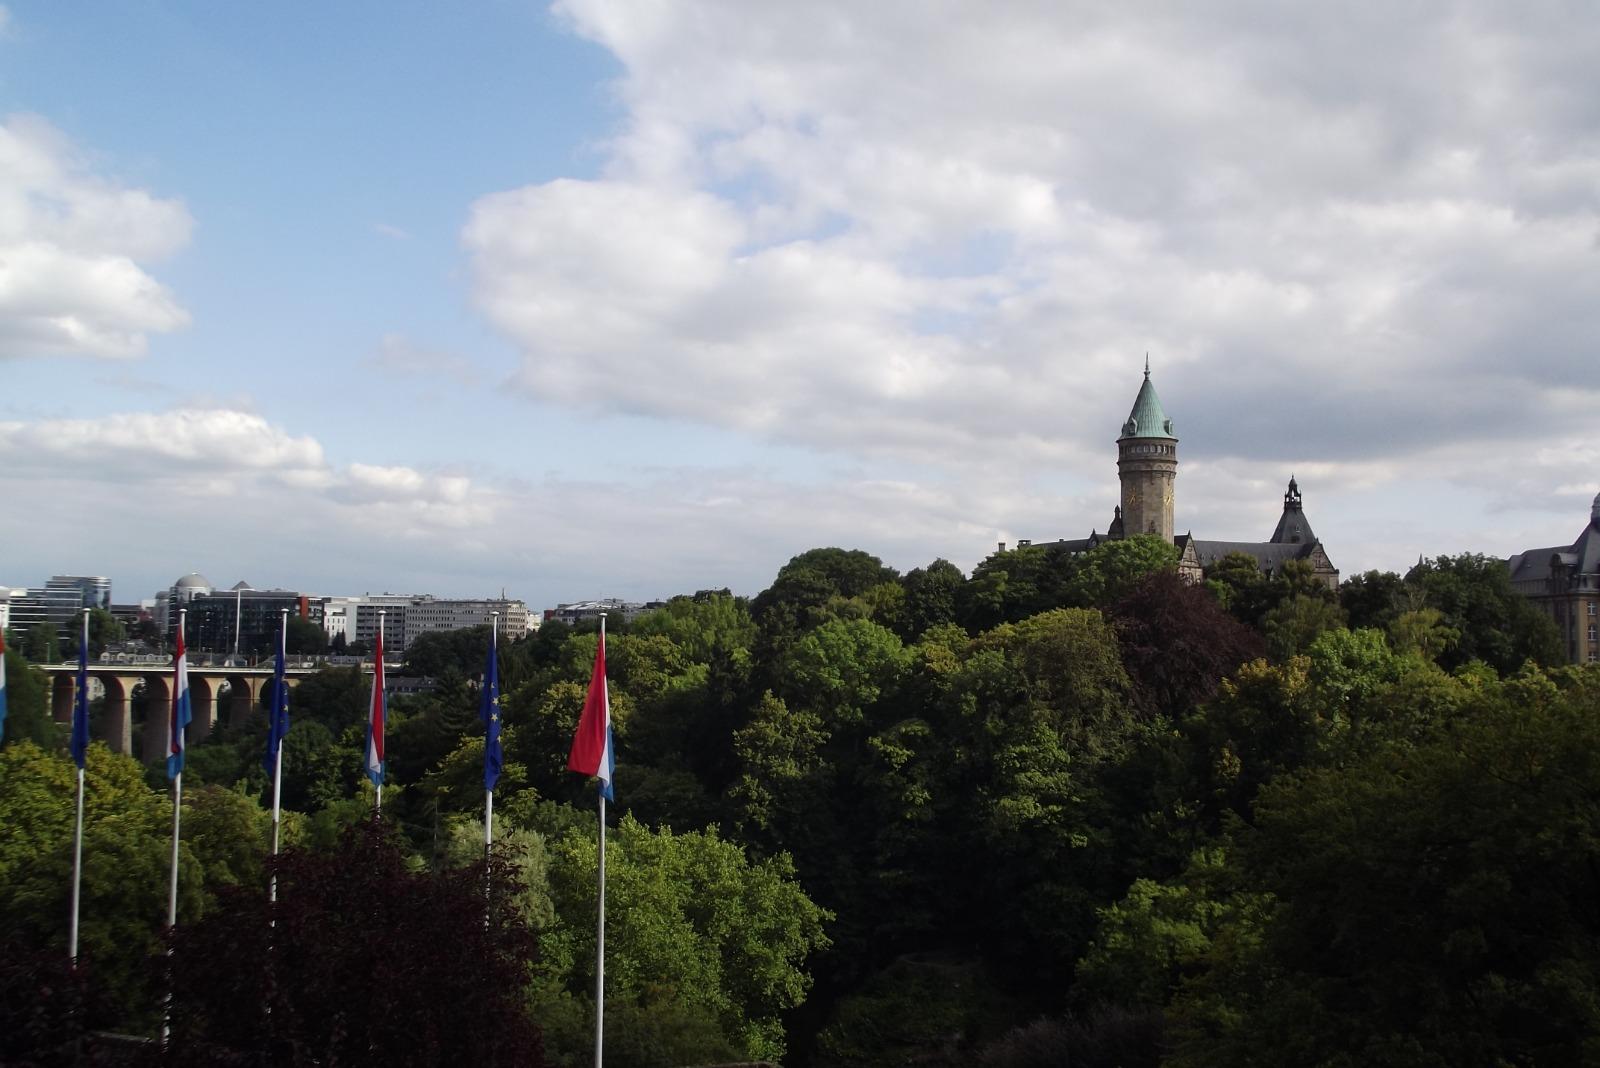 belgioelussemburgo2-1600418606.jpg